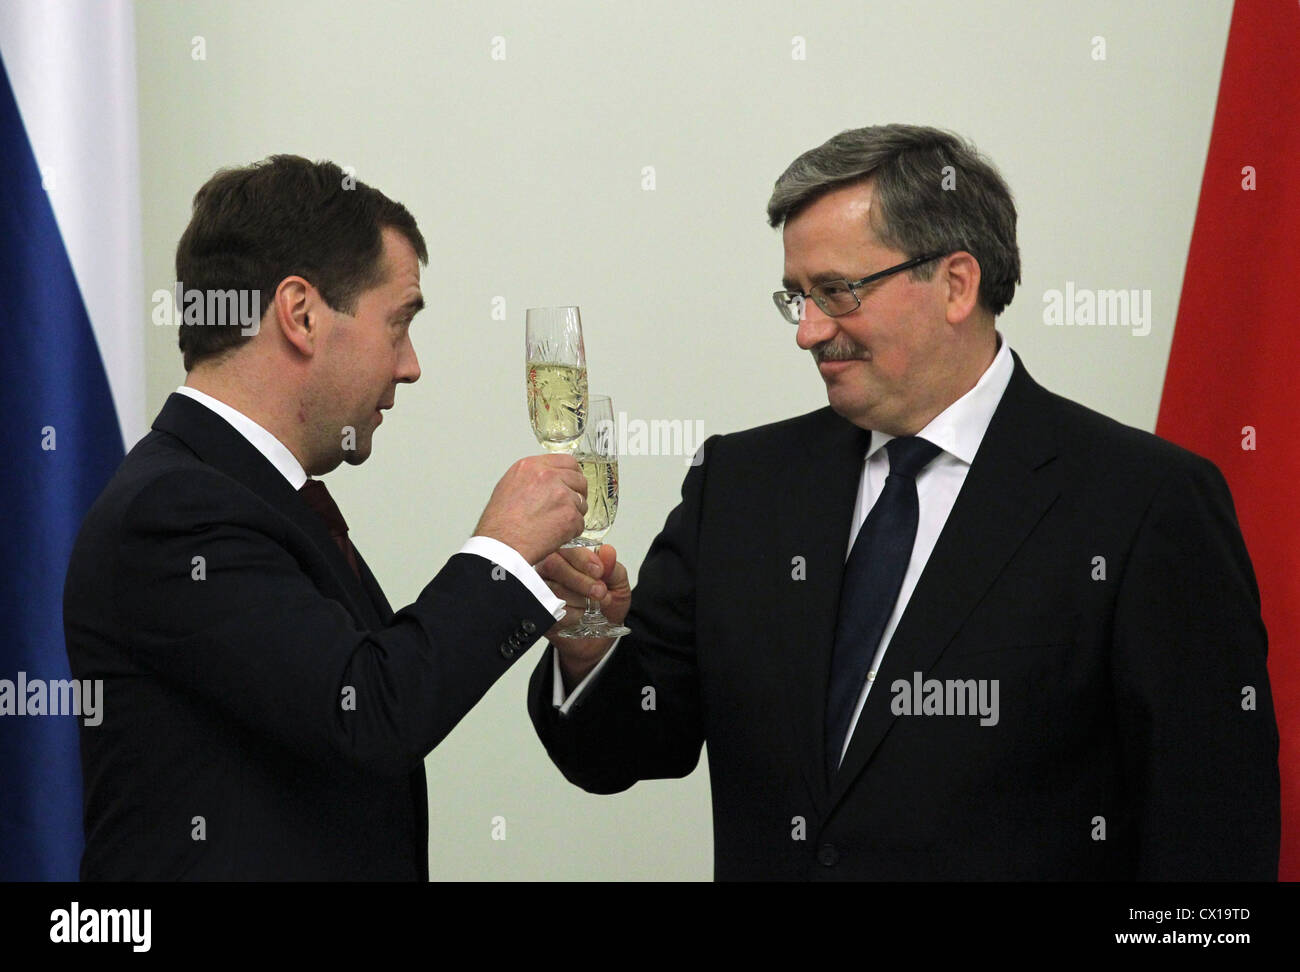 ITAR-TASS: WARSAW, POLAND. DECEMBER 6, 2010. Russian president Dmitry Medvedev (L) and Polish president Bronislaw - Stock Image